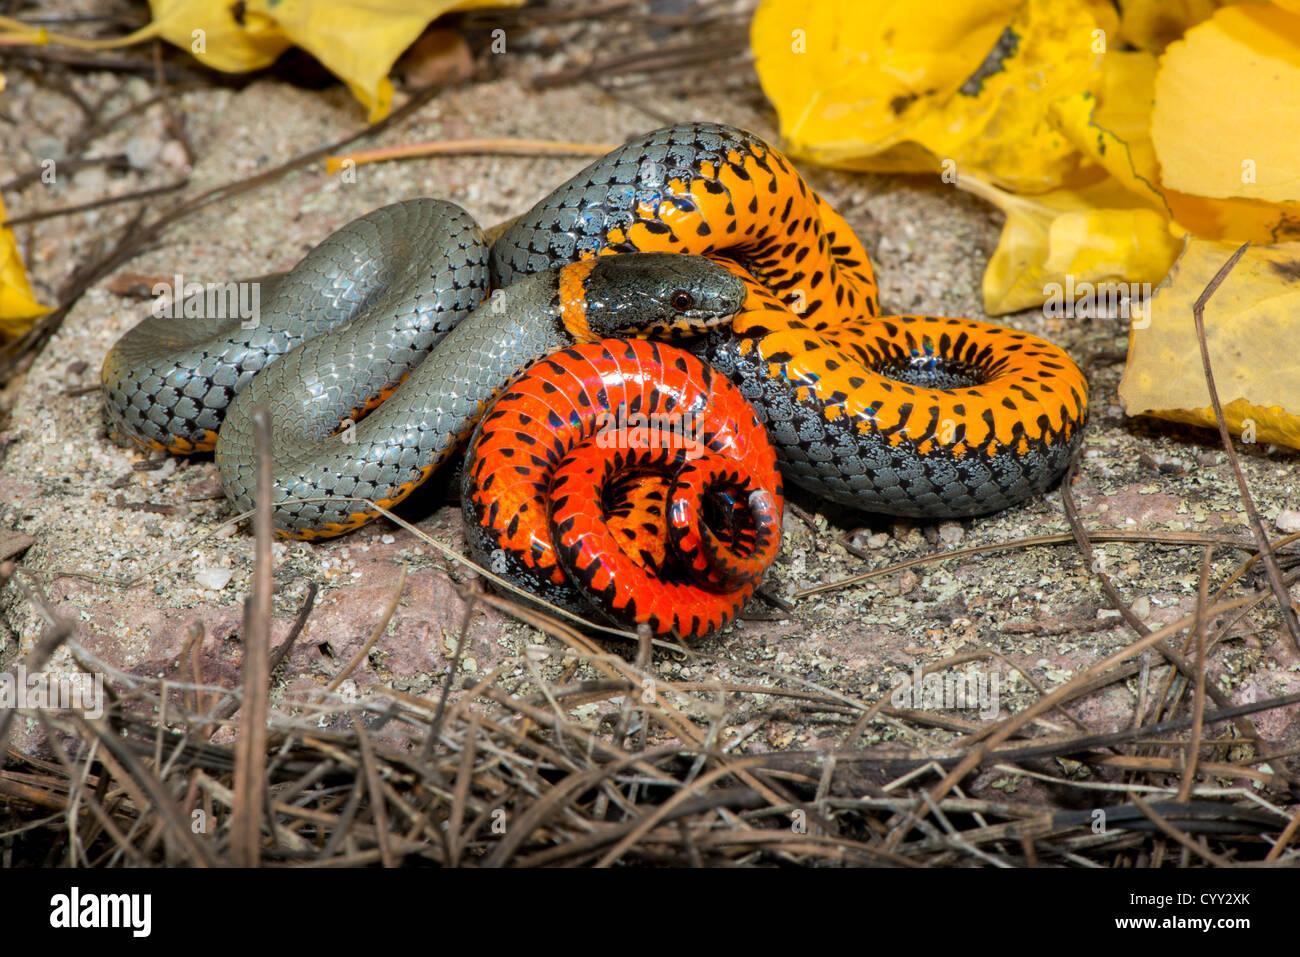 Arizona cochise county cochise - Ring Necked Snake Diadophis Punctatus Chiricahua Mountains Cochise County Arizona United States 19 October Adult Colubridae